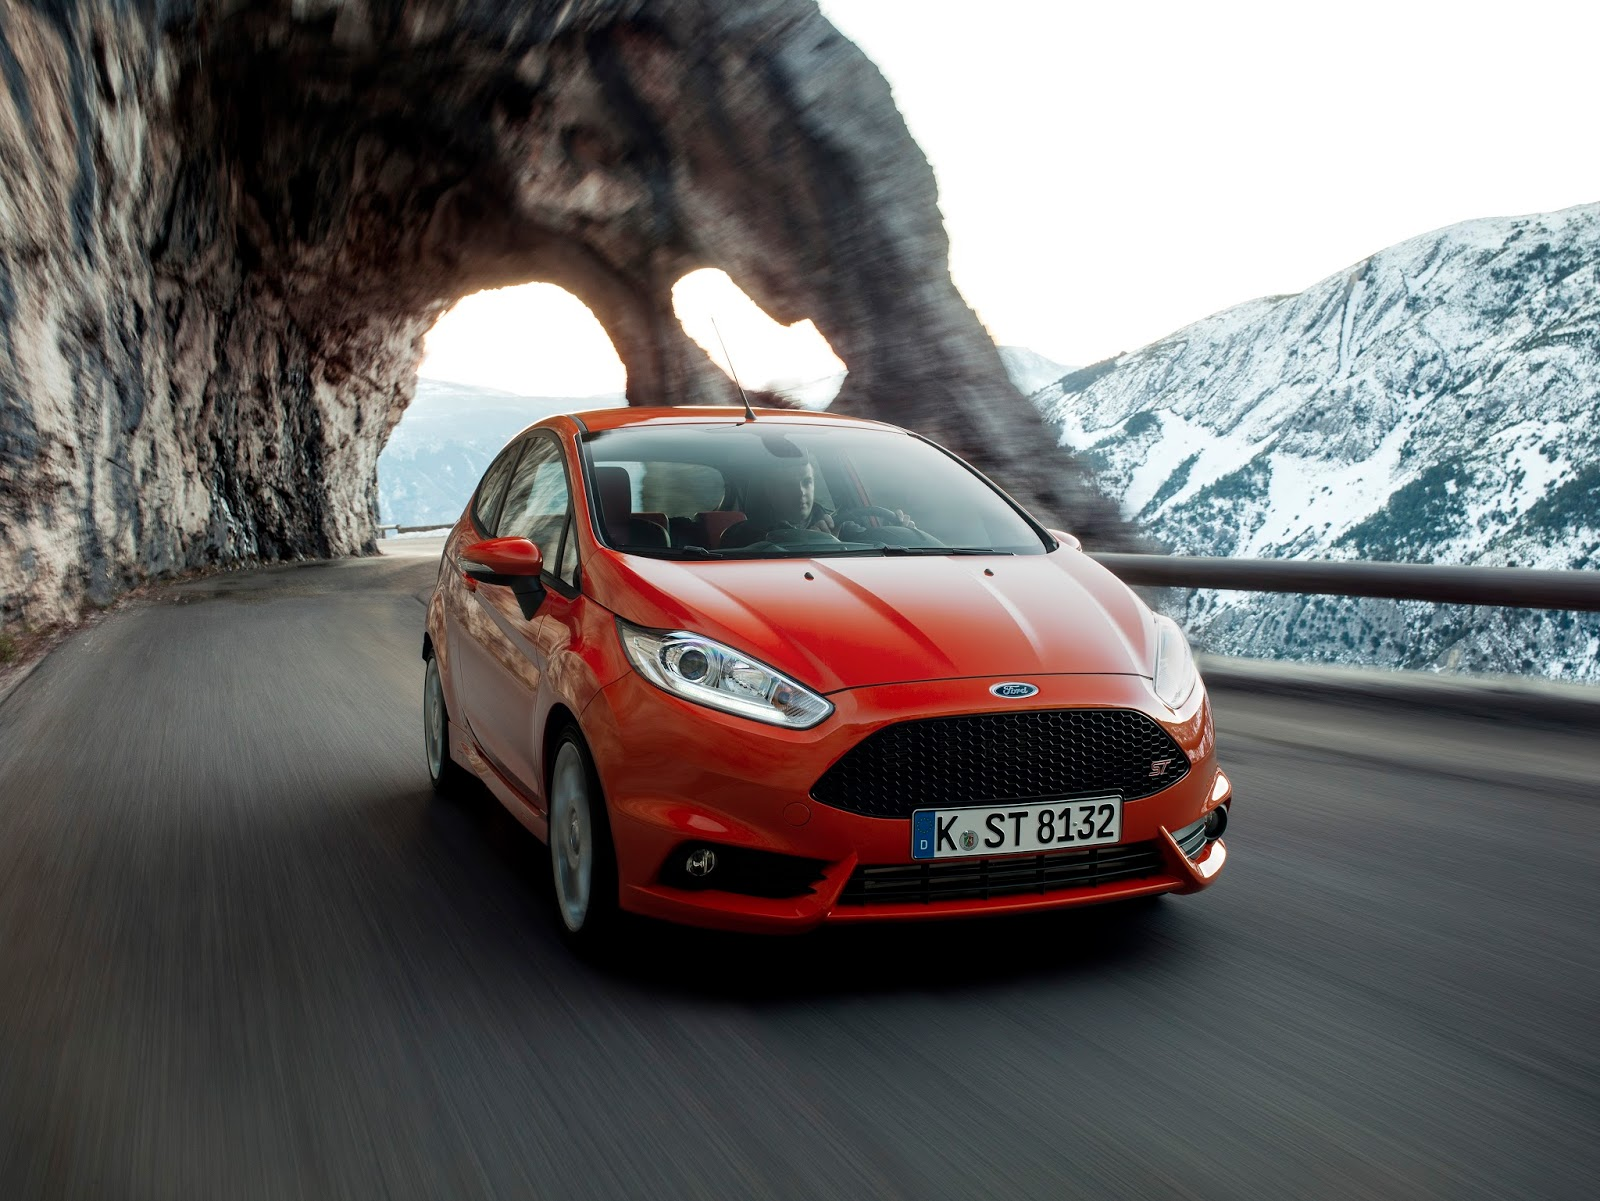 FiestaST 03 1 Το Ford Fiesta ST διαθέσιμο σε 5θυρη έκδοση Ford, Ford Fiesta, Ford Fiesta ST, Hatcback, videos, αγορά, τιμες